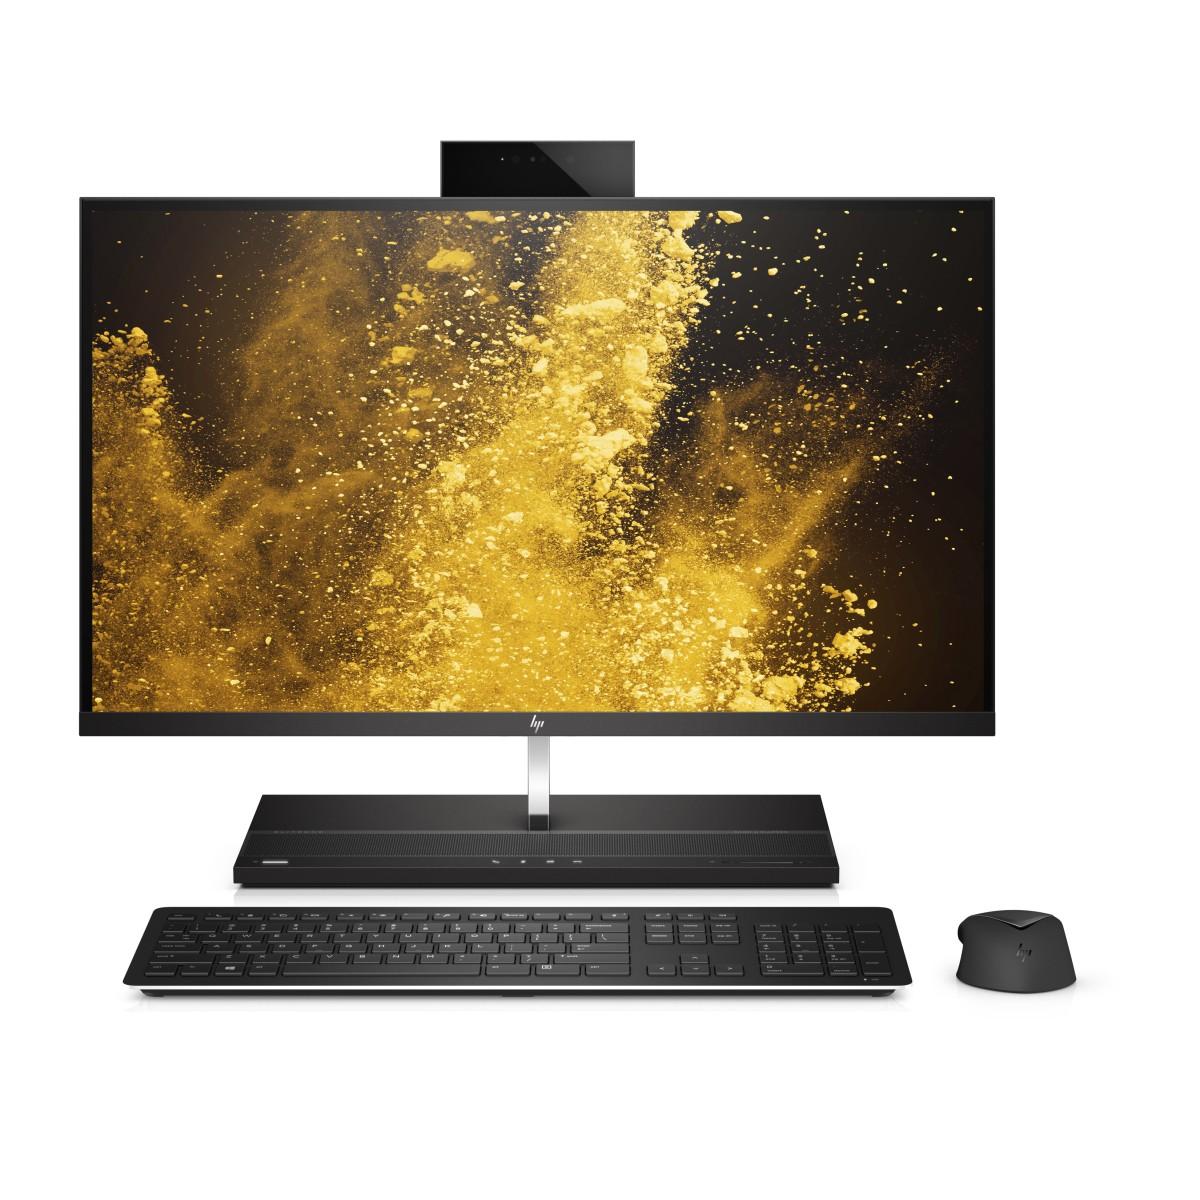 Obrázok produktu HP EliteOne 1000 G1 AiO 27 NT i7-7700/ 8/ 512G/ 3NBD/ W10P